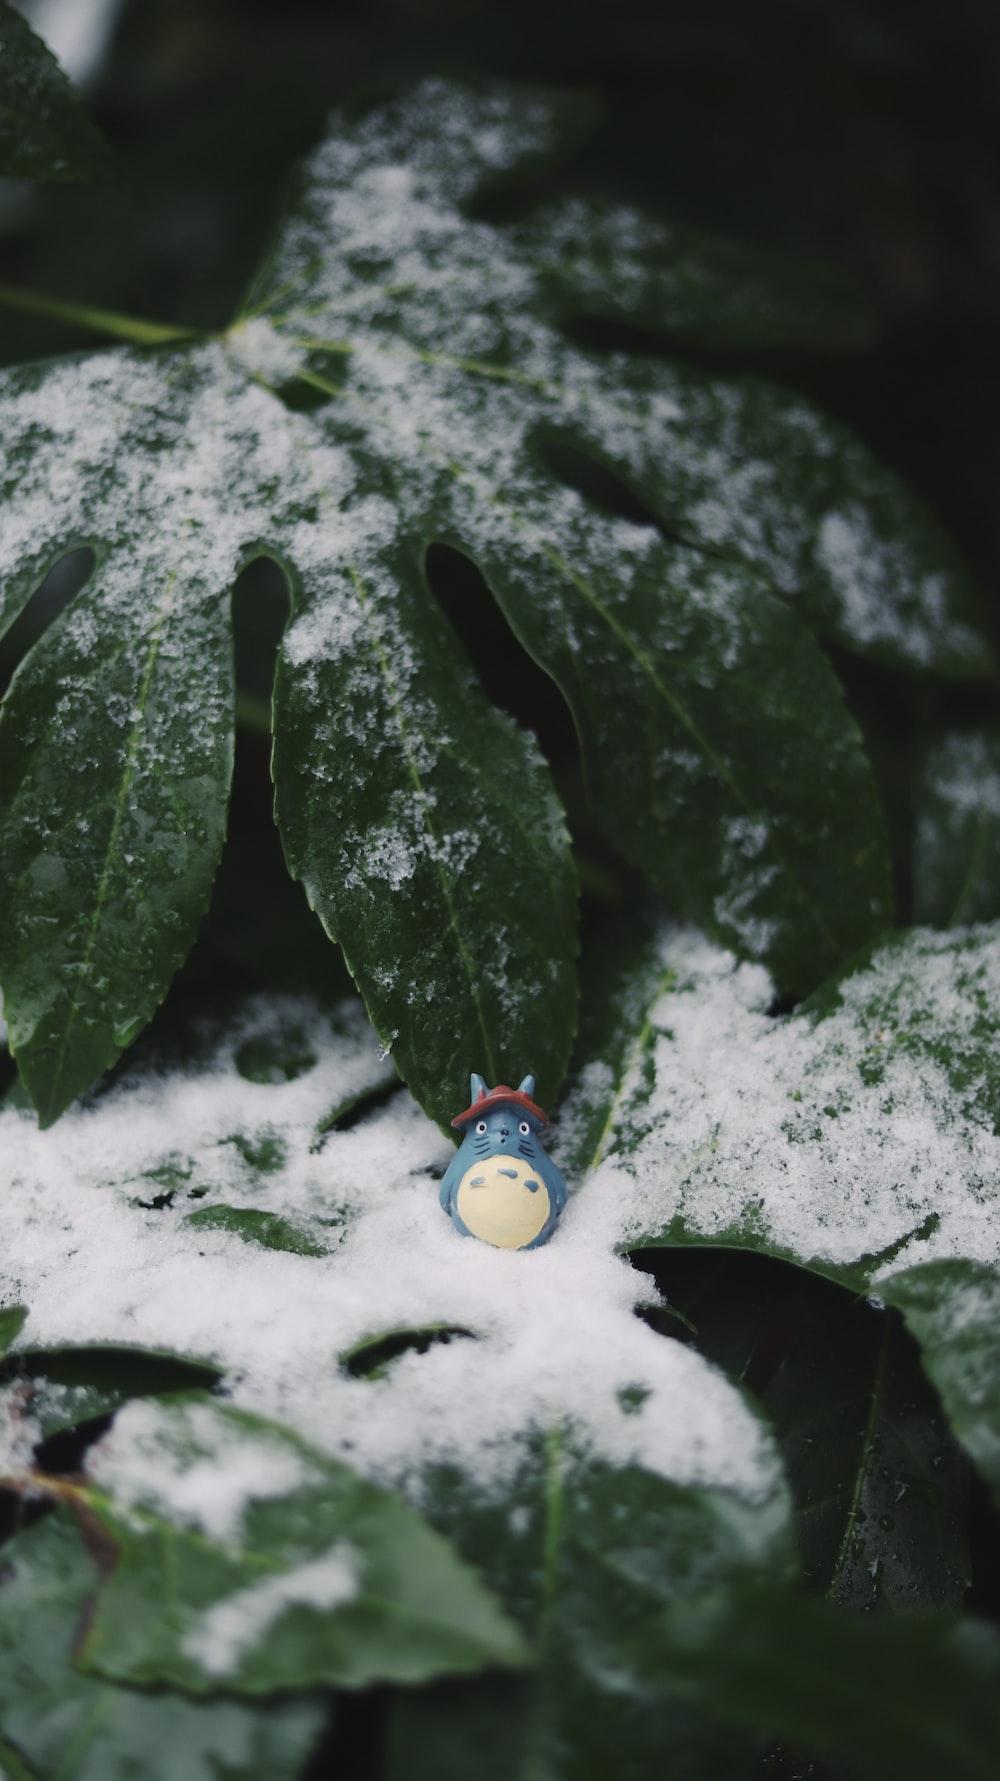 Totoro plastic toy on green leaf